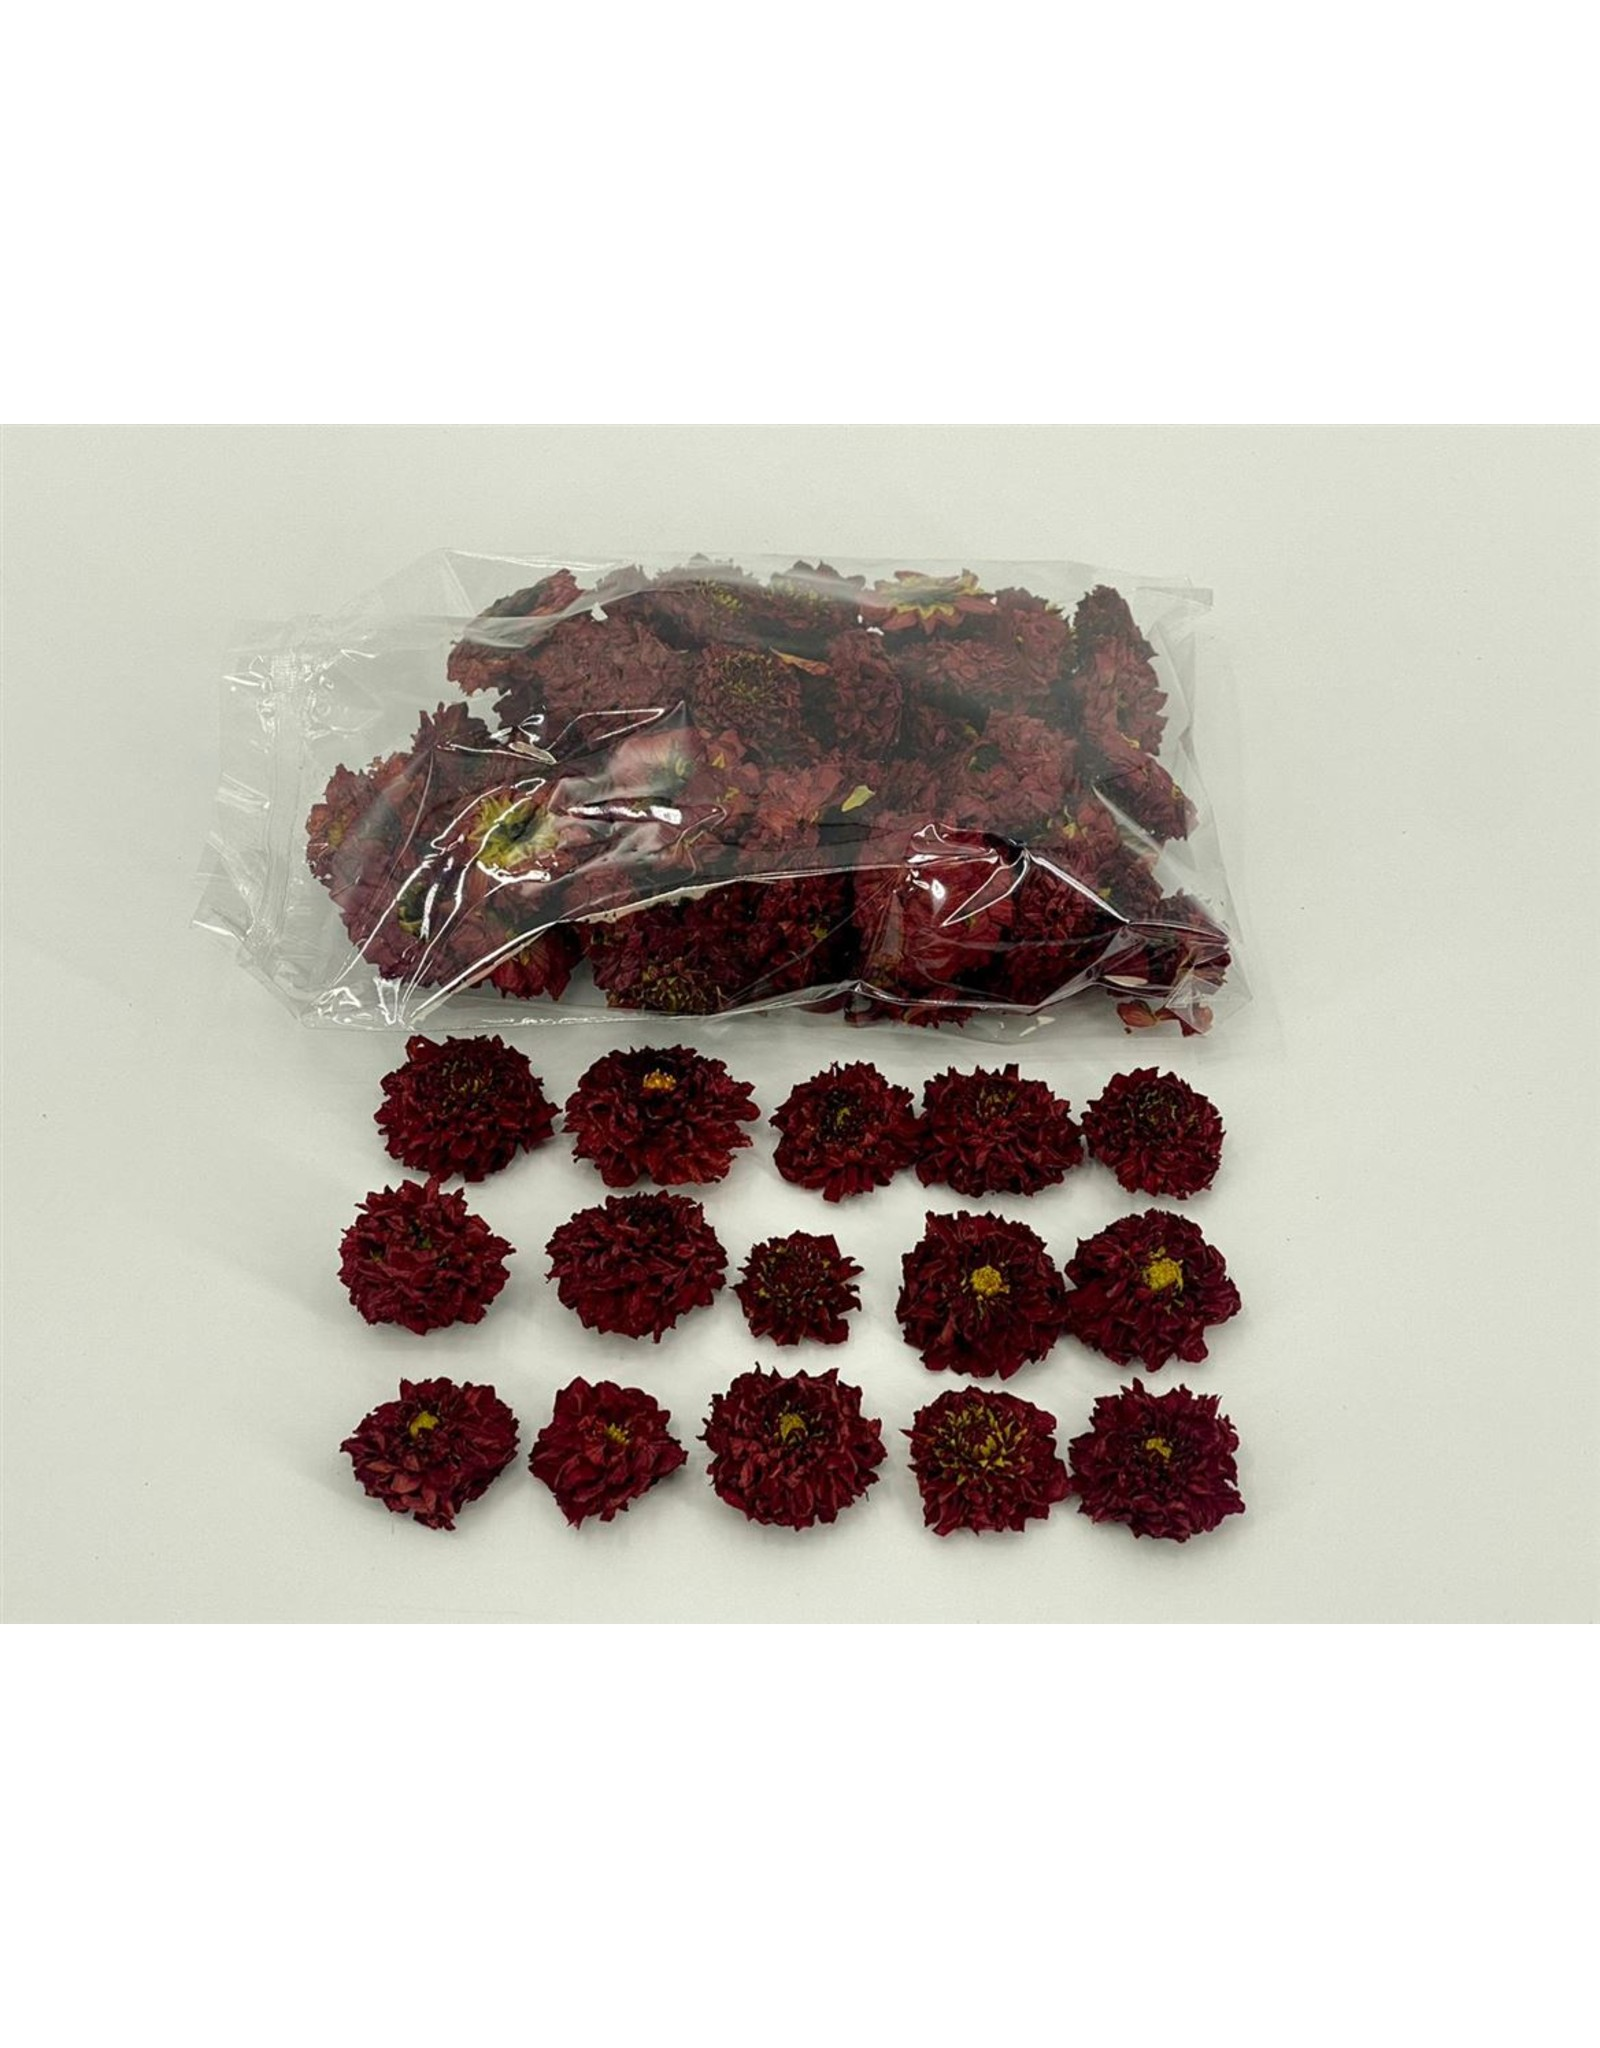 Dried Dahlia Heads Red Bag (50-60 Heads) x 1